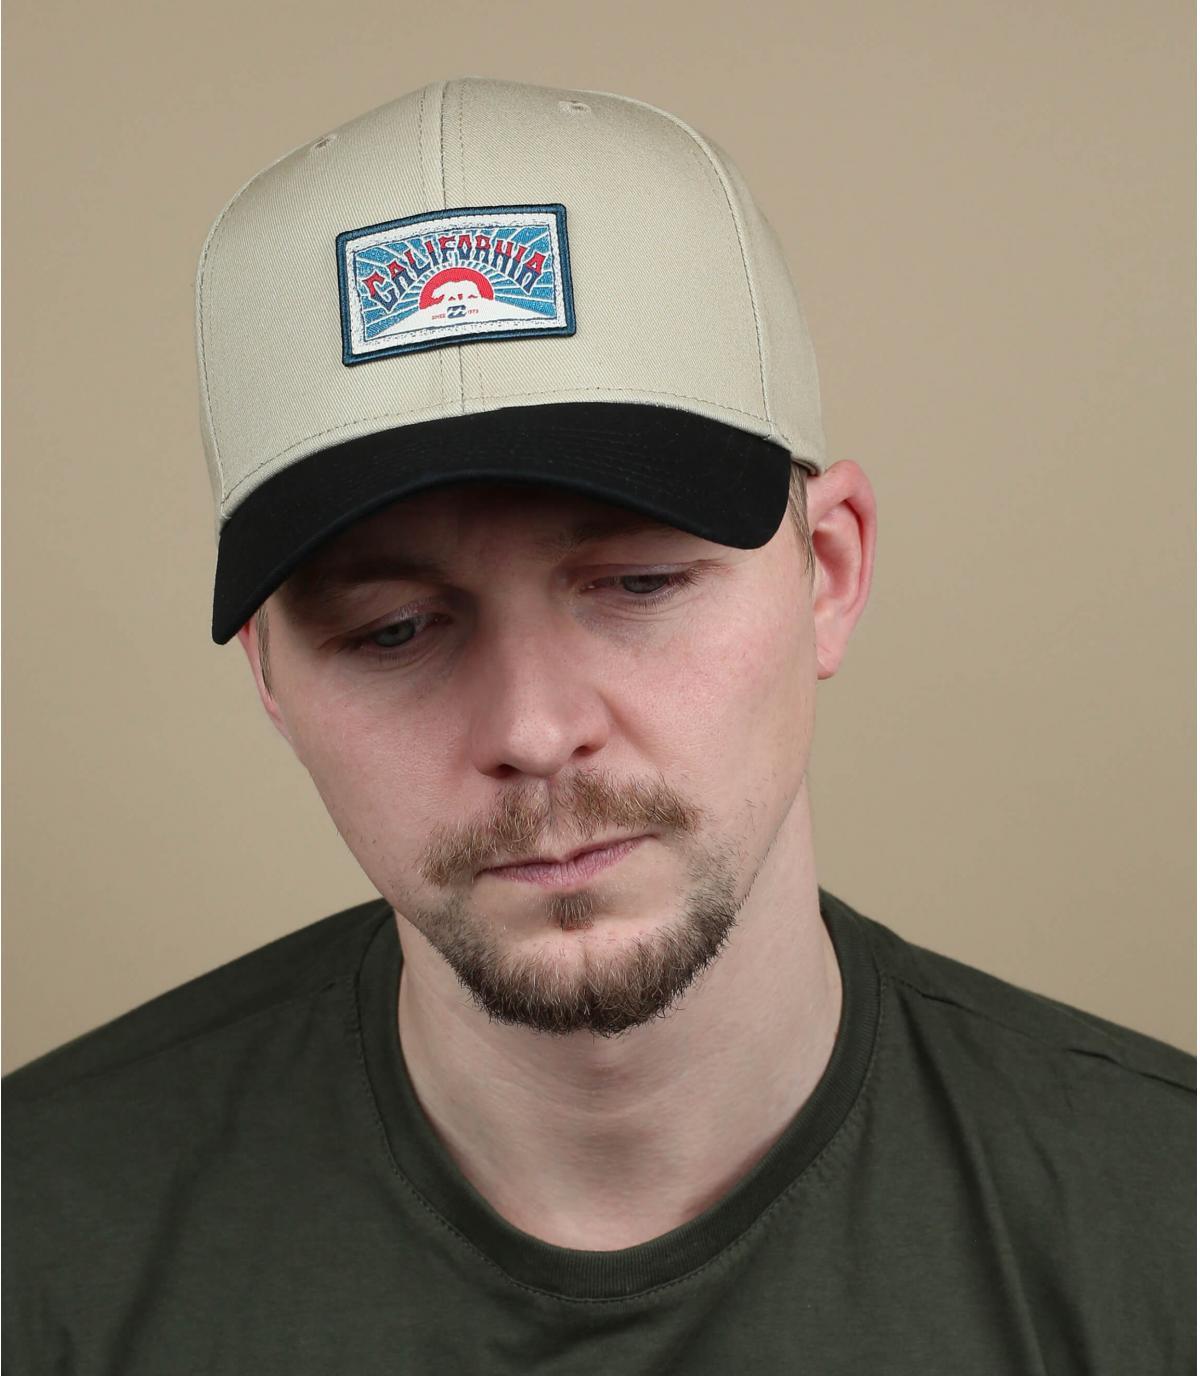 Billabong California cap